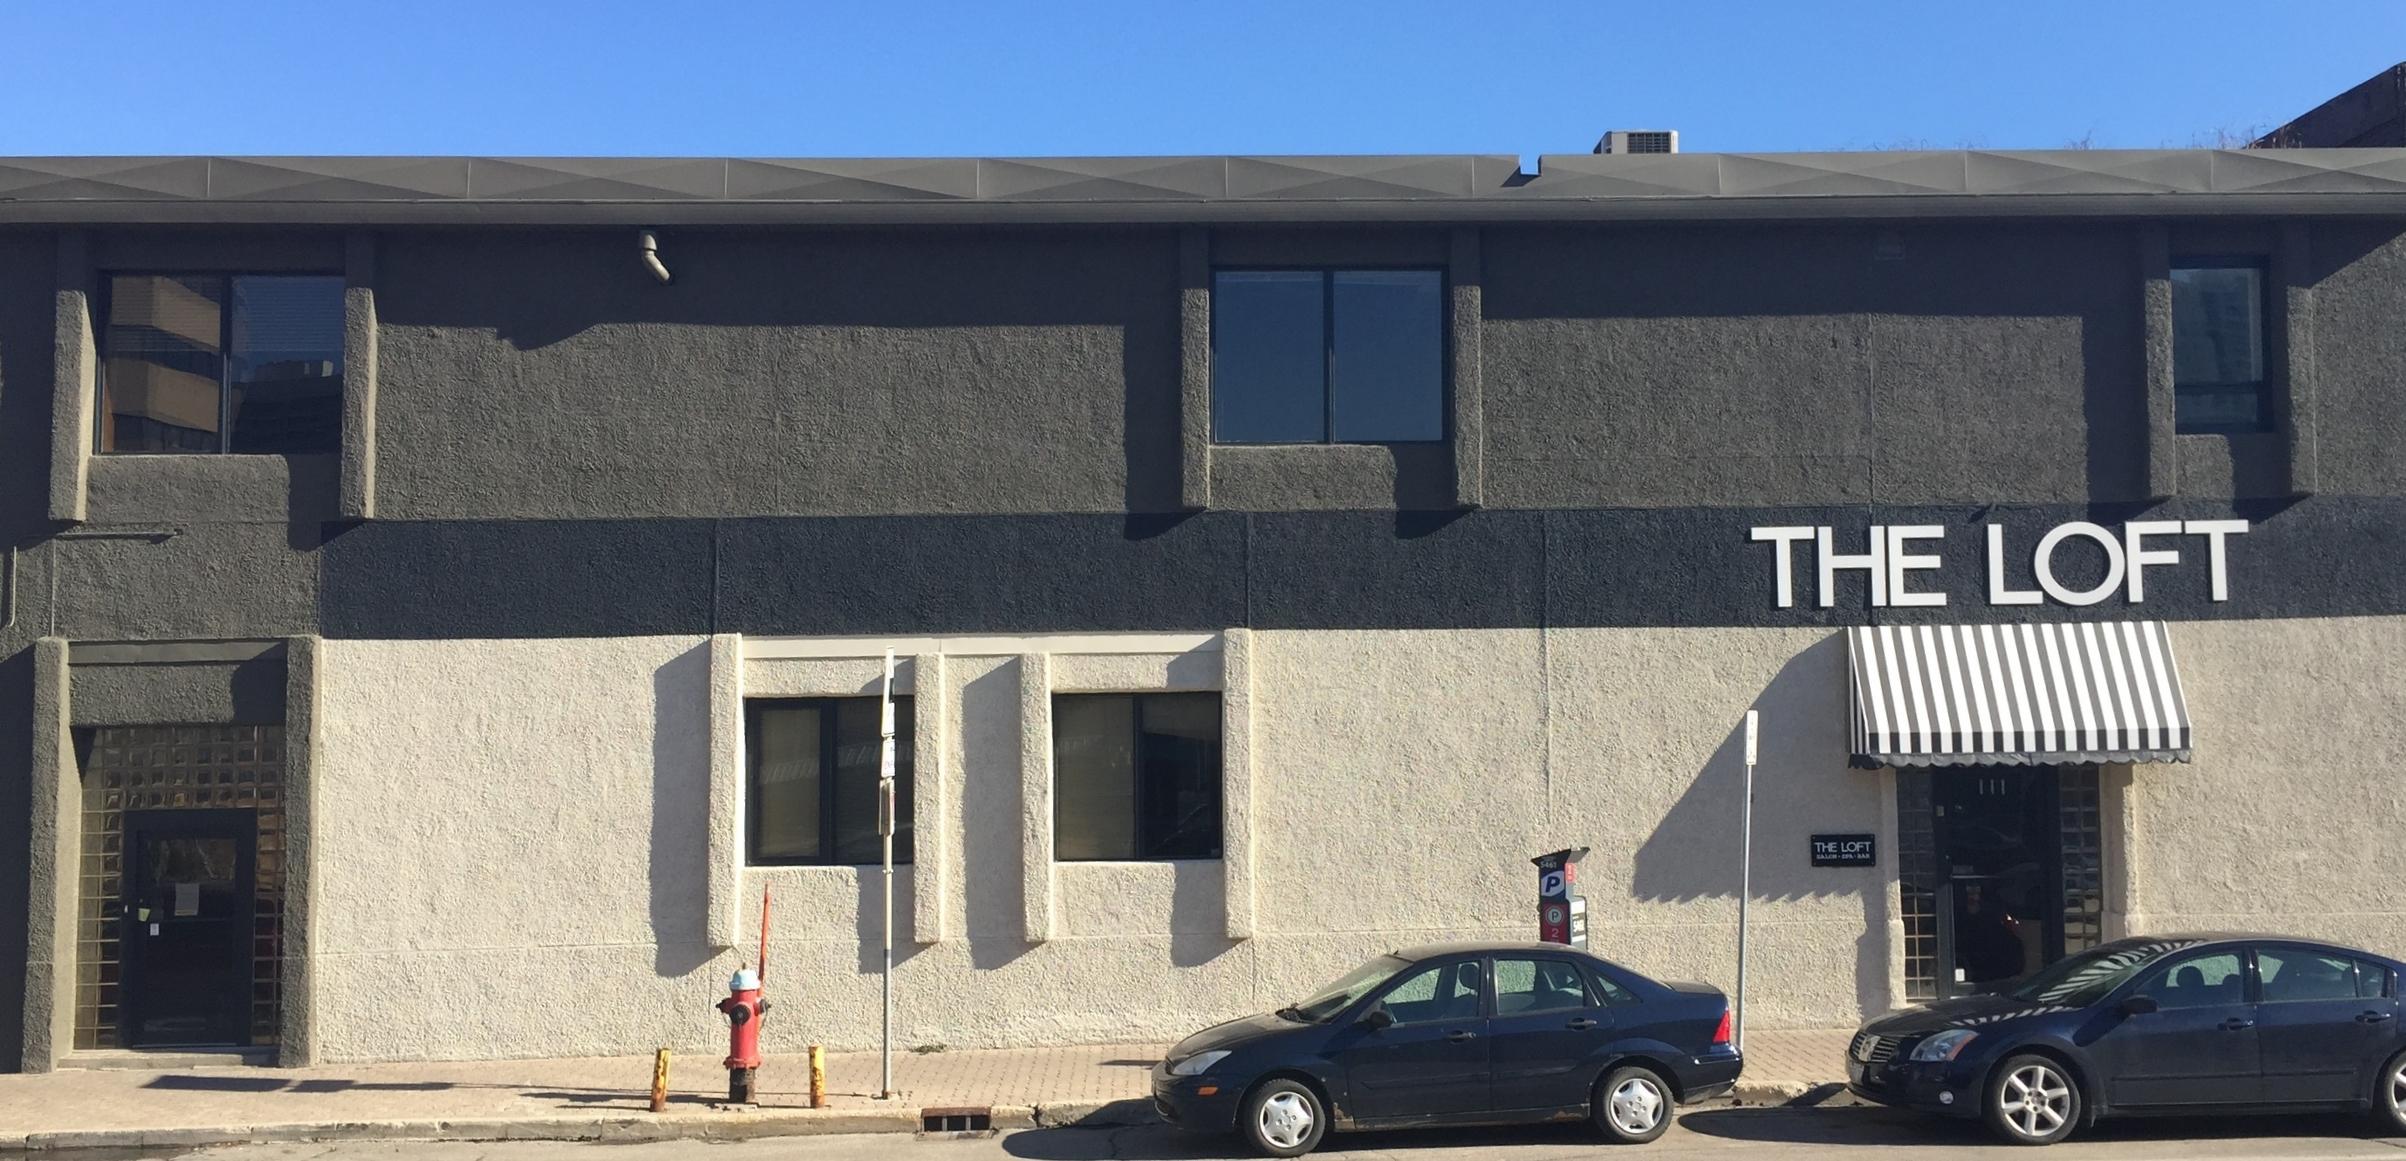 Our gorgeous new exterior renovation!